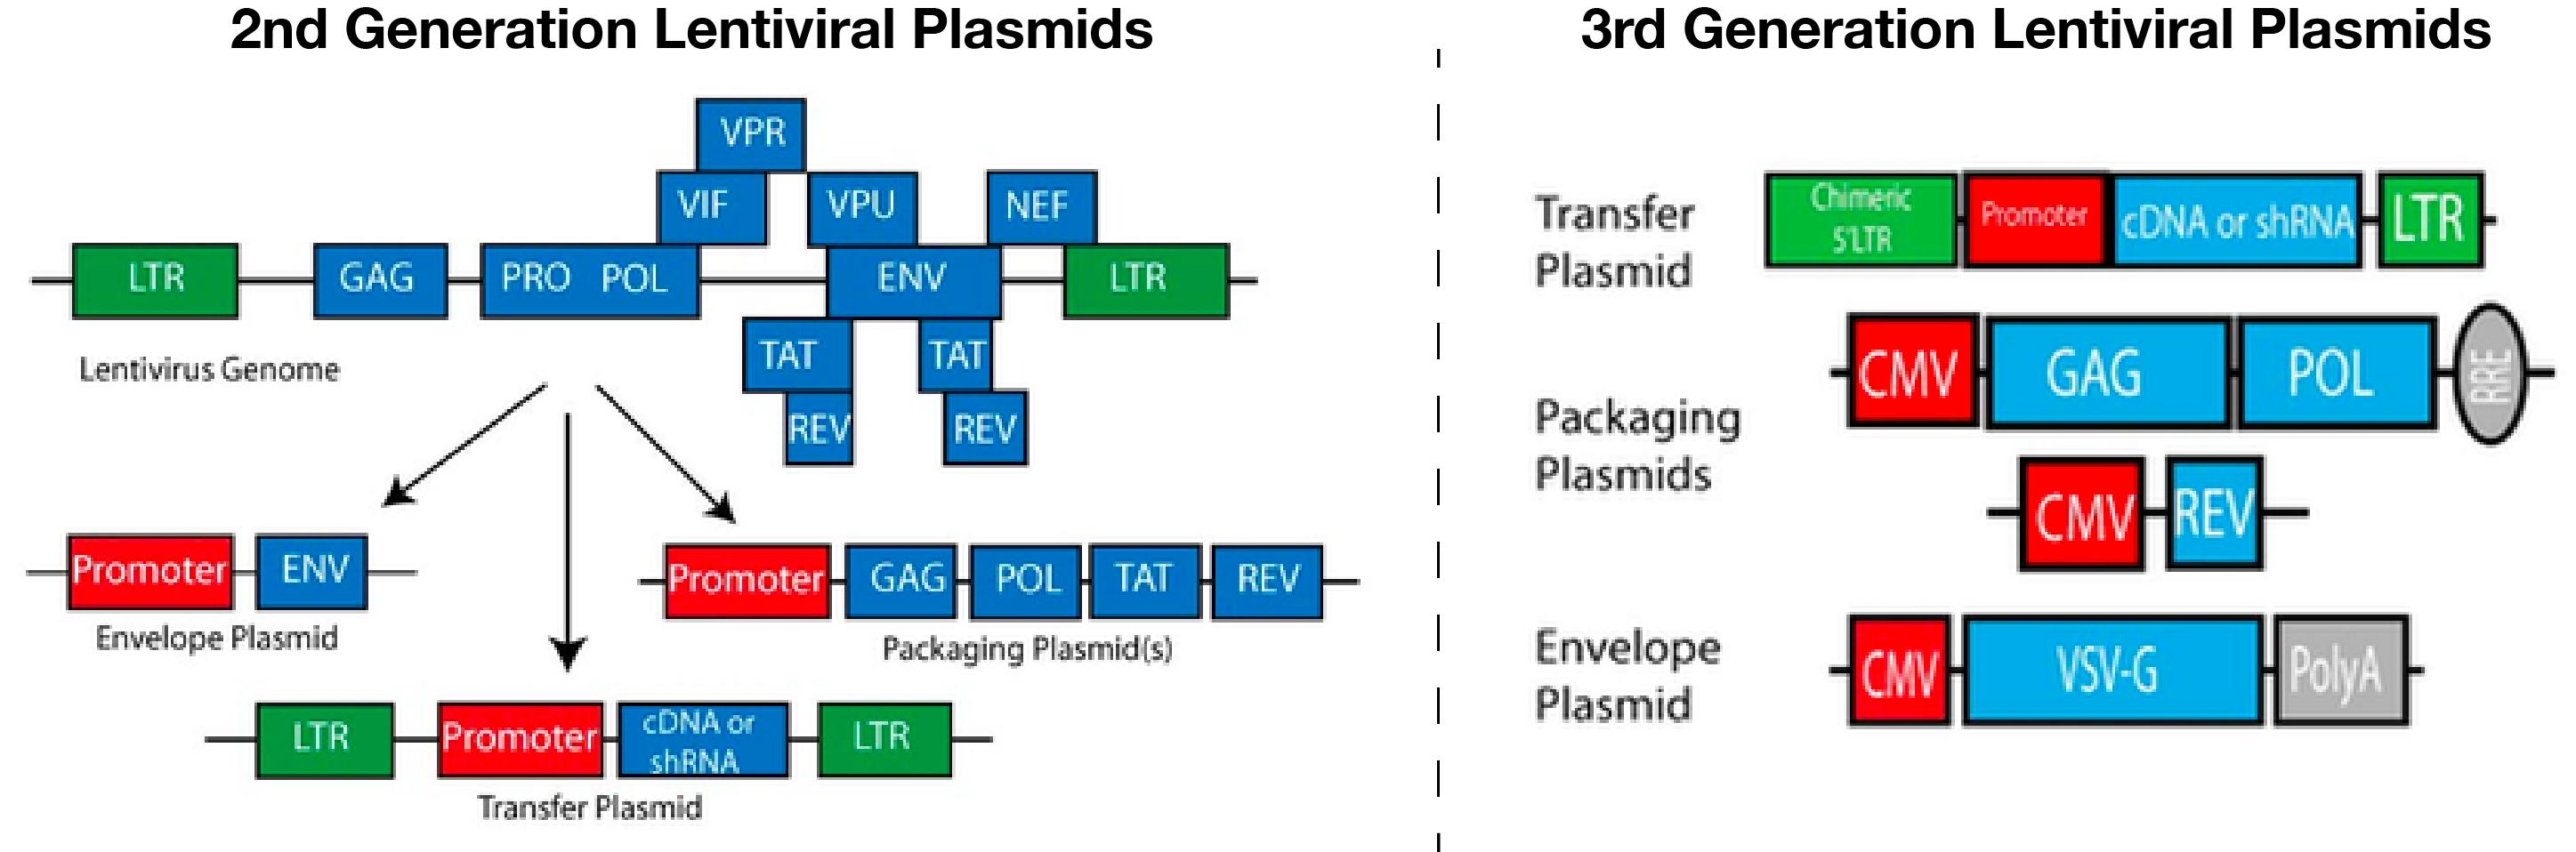 2nd and 3rd Generation Lentiviral Plasmids